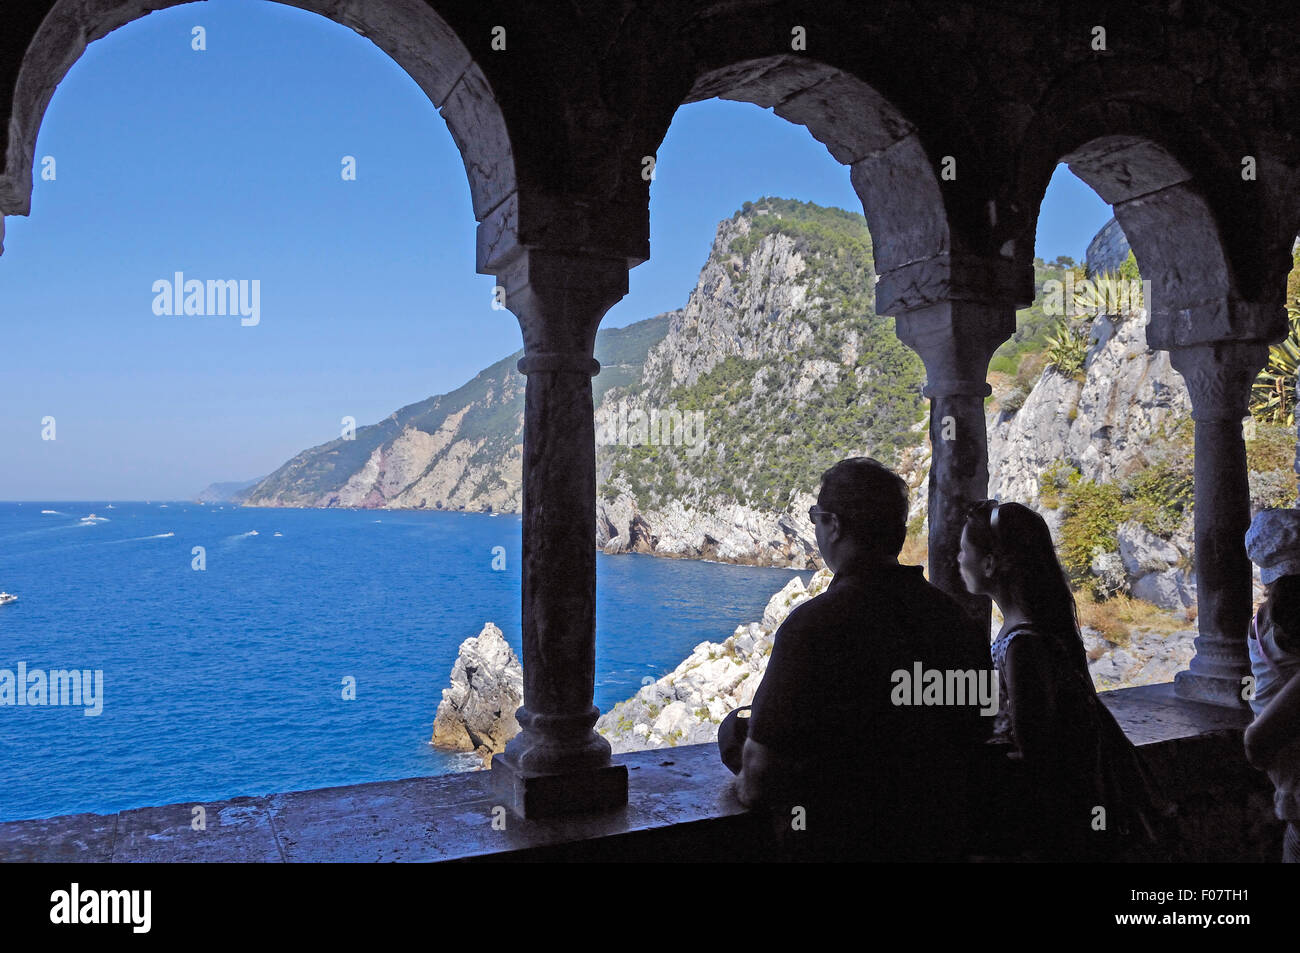 Ligurian coast through pilars of Church San Pietro at Portovenere Sea of Liguria Mediterranean Sea Italy - Stock Image